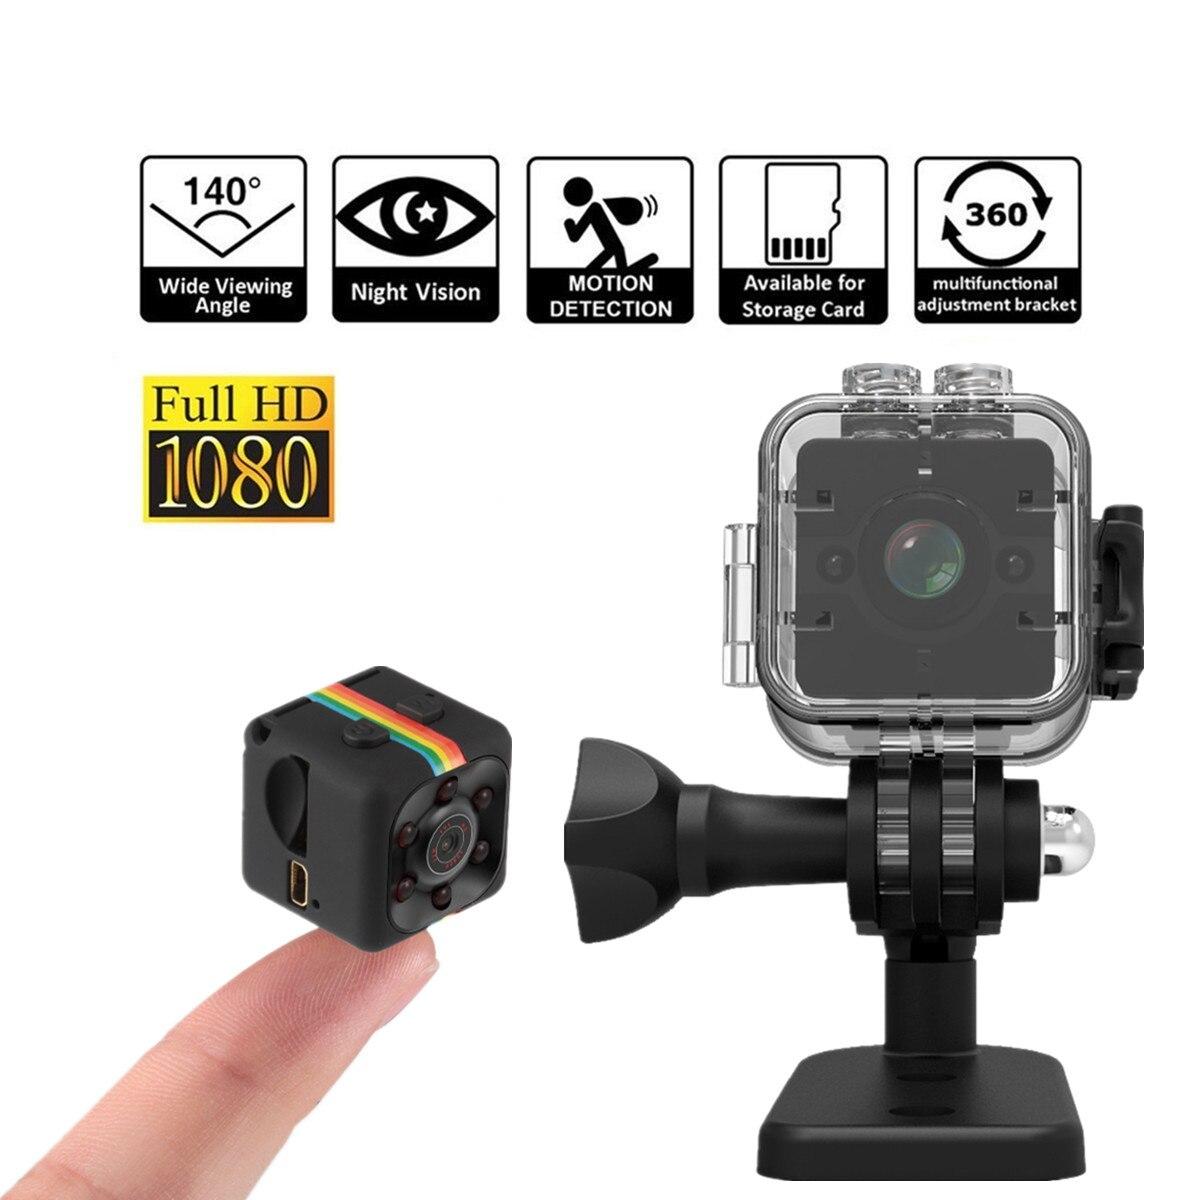 Mini Camera SQ11 1080P Full HD Micro Cam Motion Detection Camcorder Infrared Night Vision Video Recorder Wide Angle sq12 SQ 11